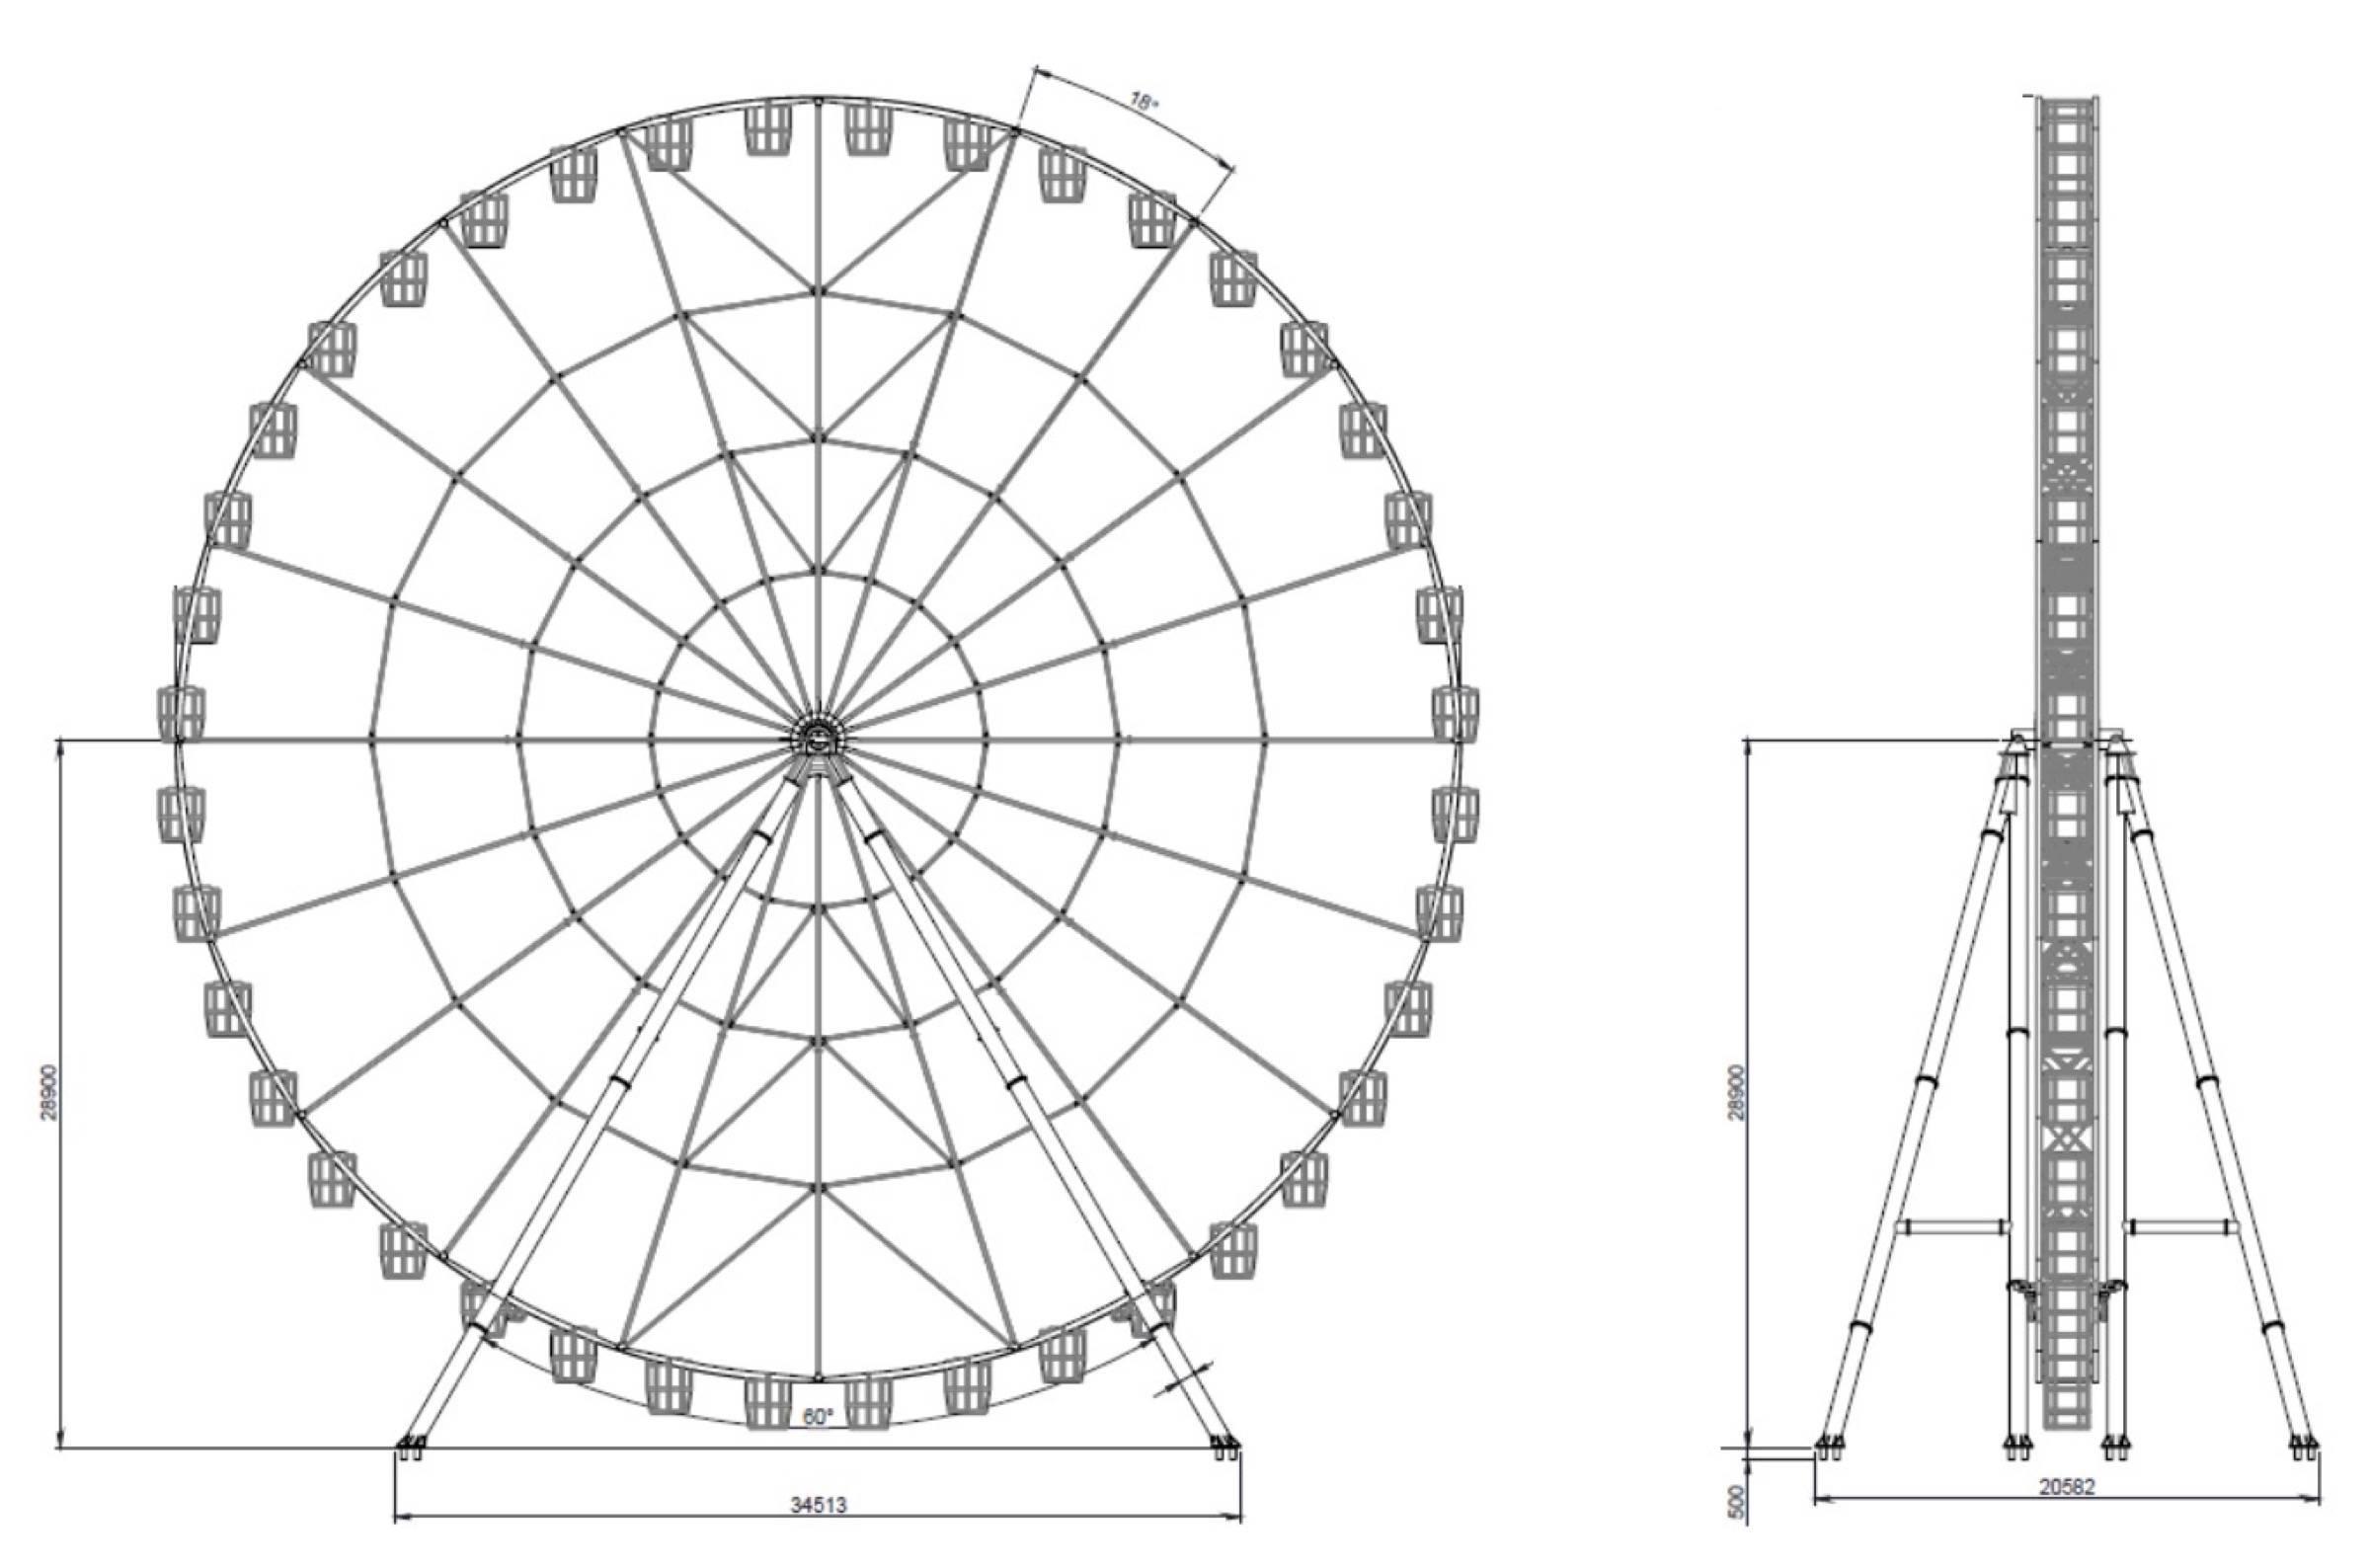 ferris wheel 60mt - technical park